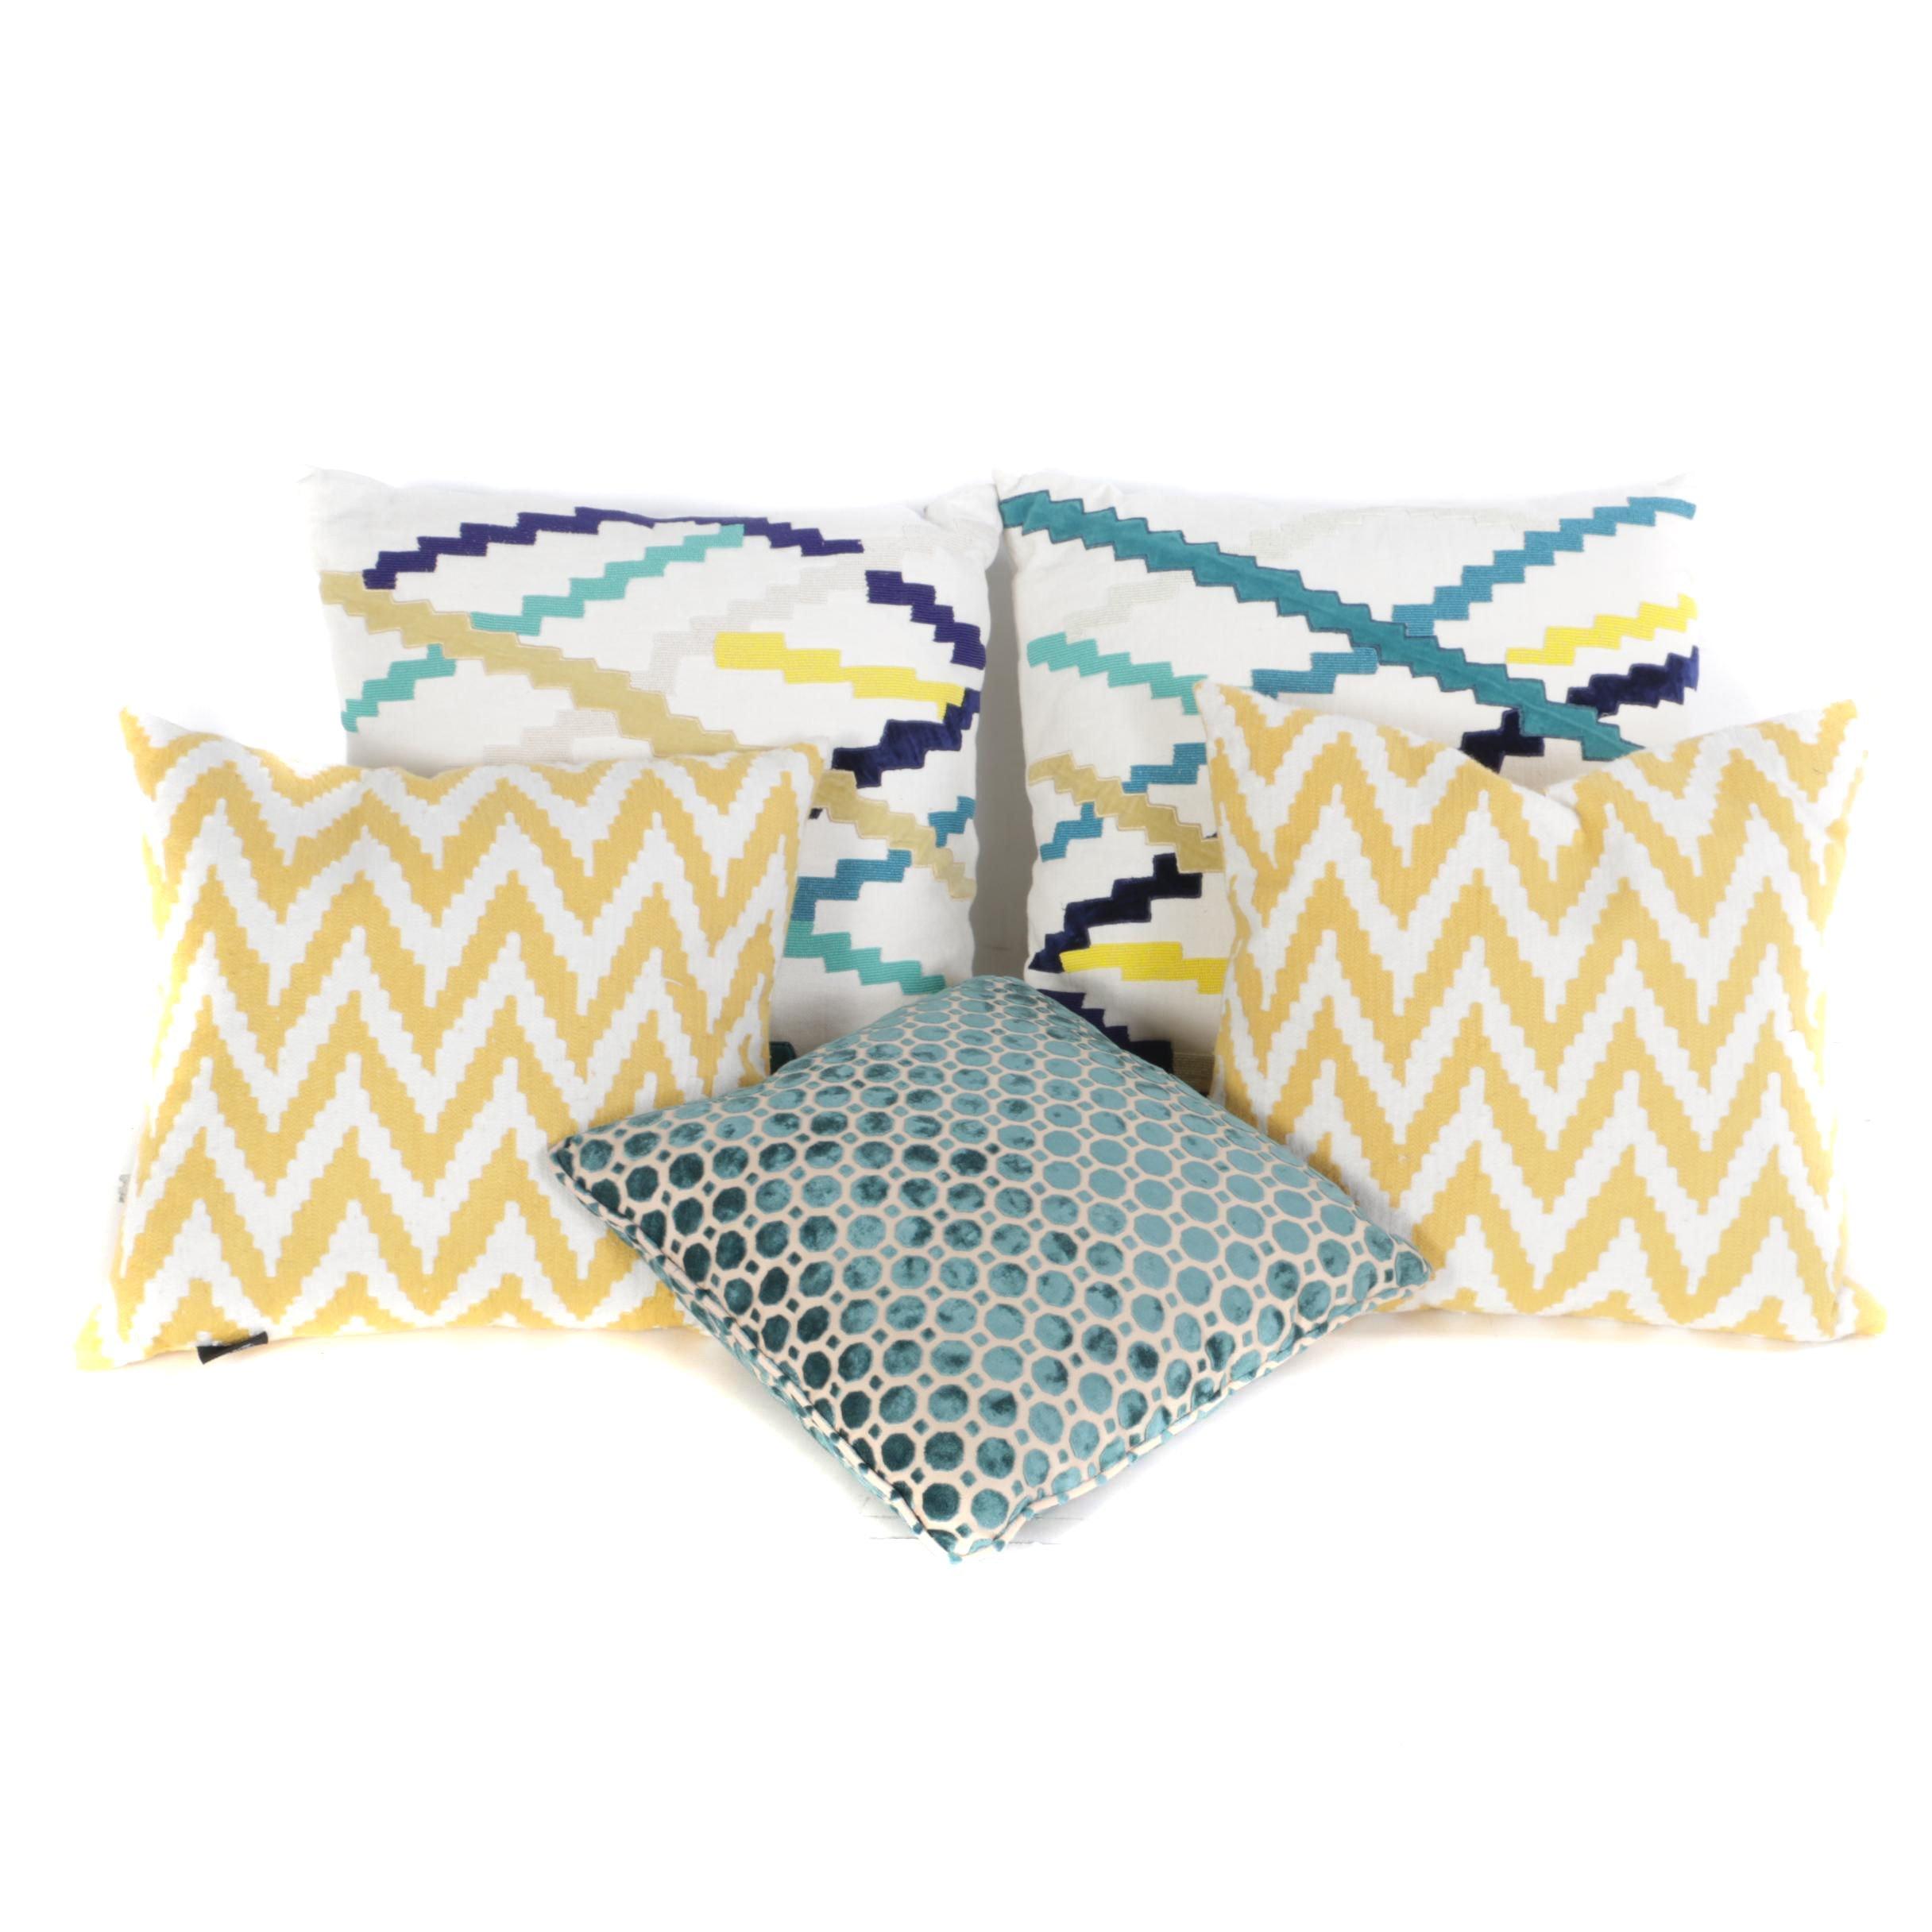 Five Pillows with Chevron and Circular Motifs